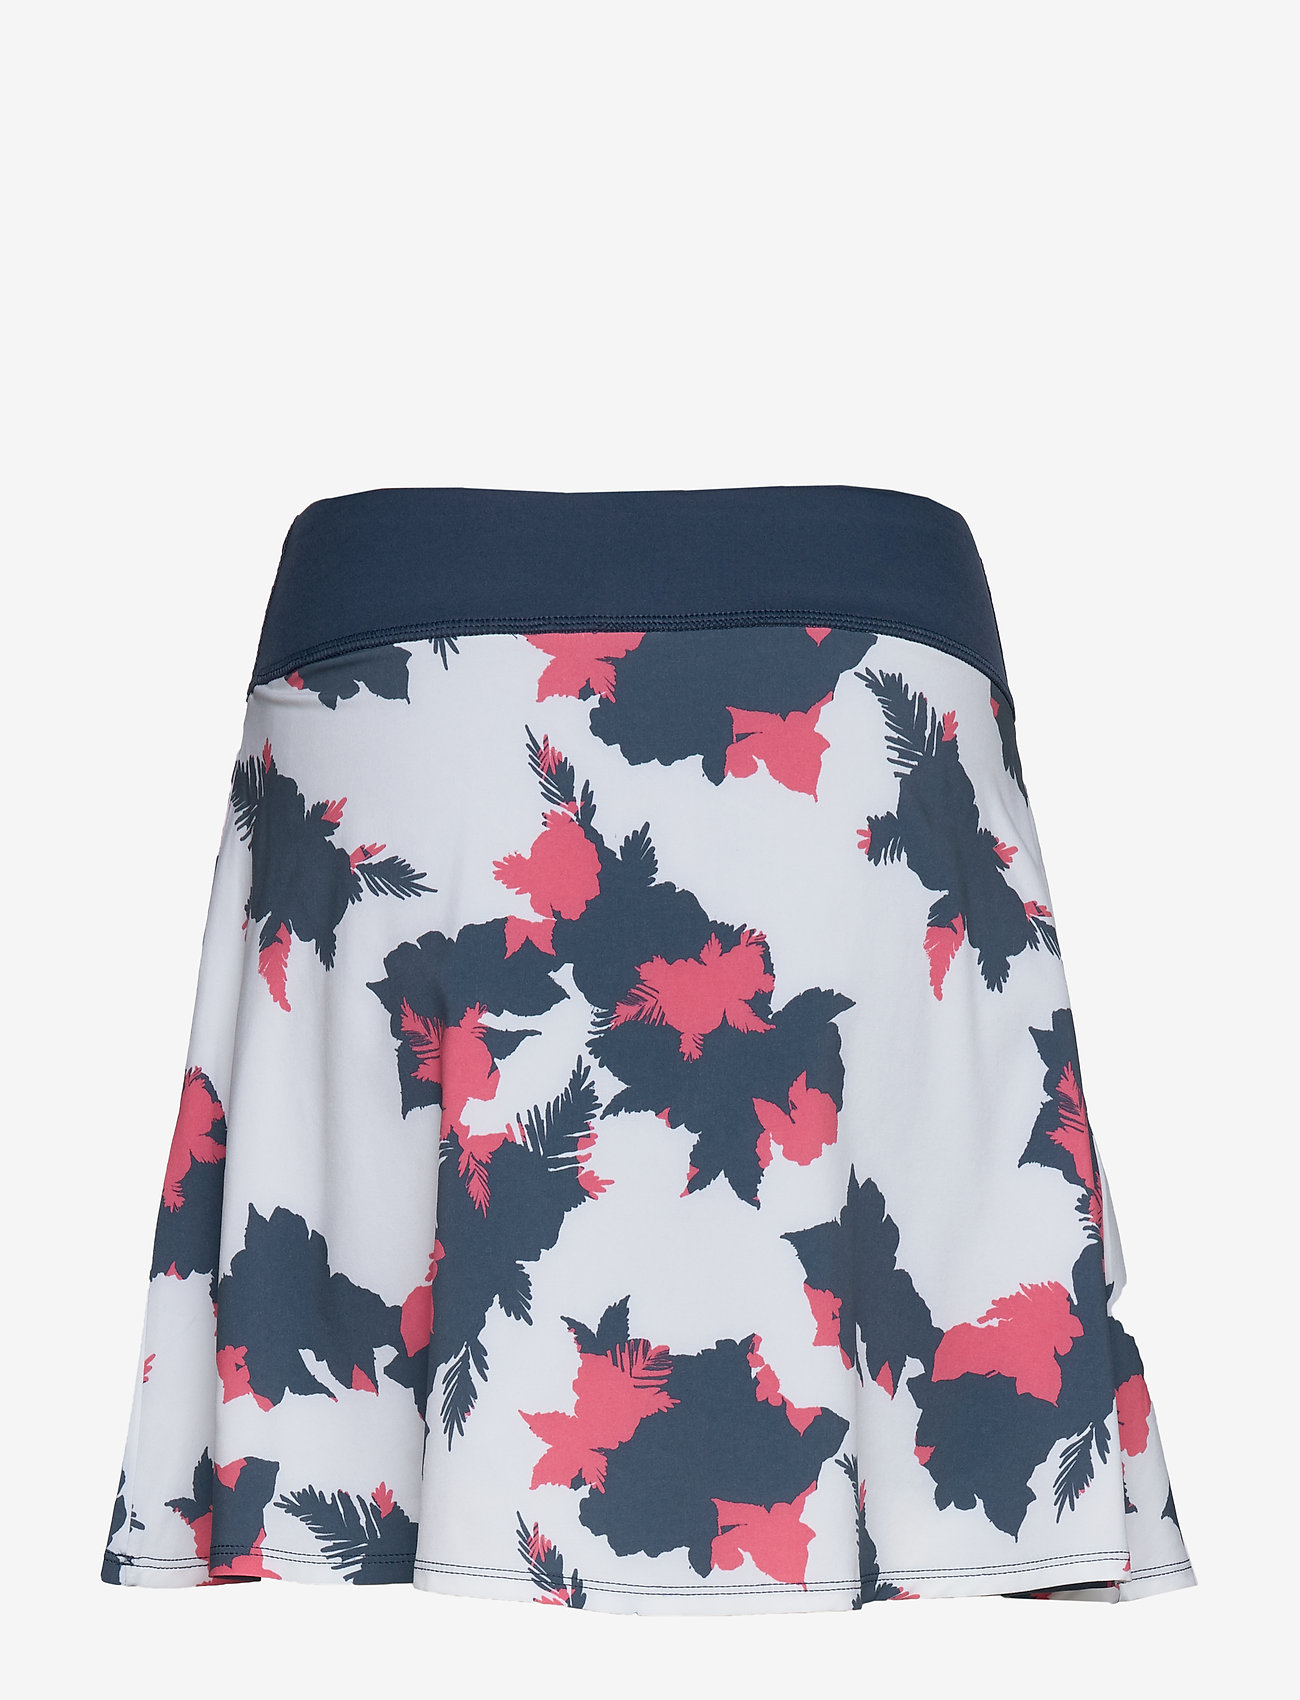 PUMA Golf - PWRSHAPE Floral Skirt - rokjes - dark denim - 1